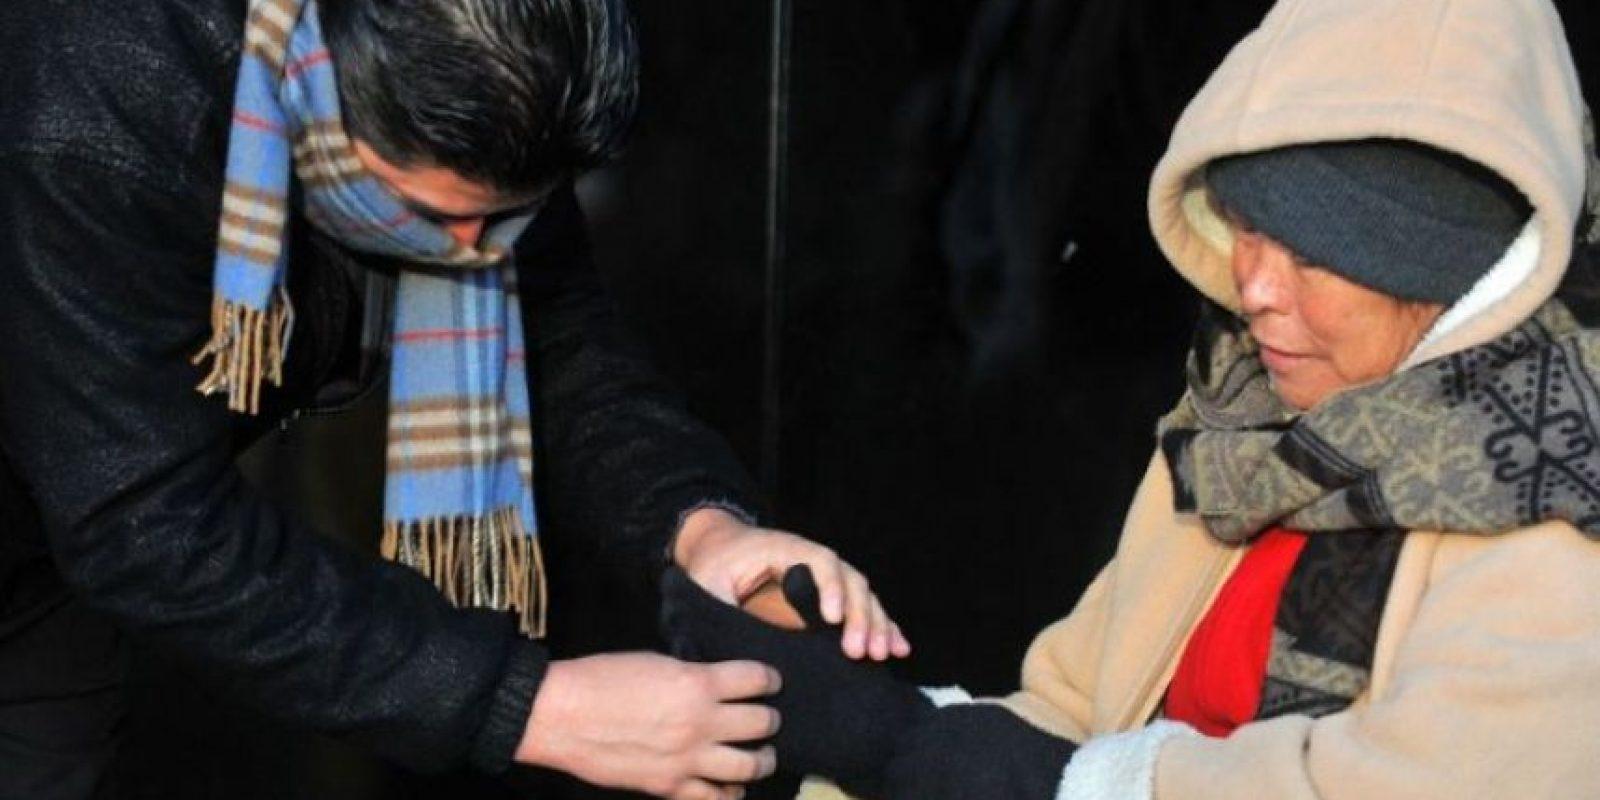 Autoridades recomiendan abrigarse. Foto:Johan Ordóñez /AFP